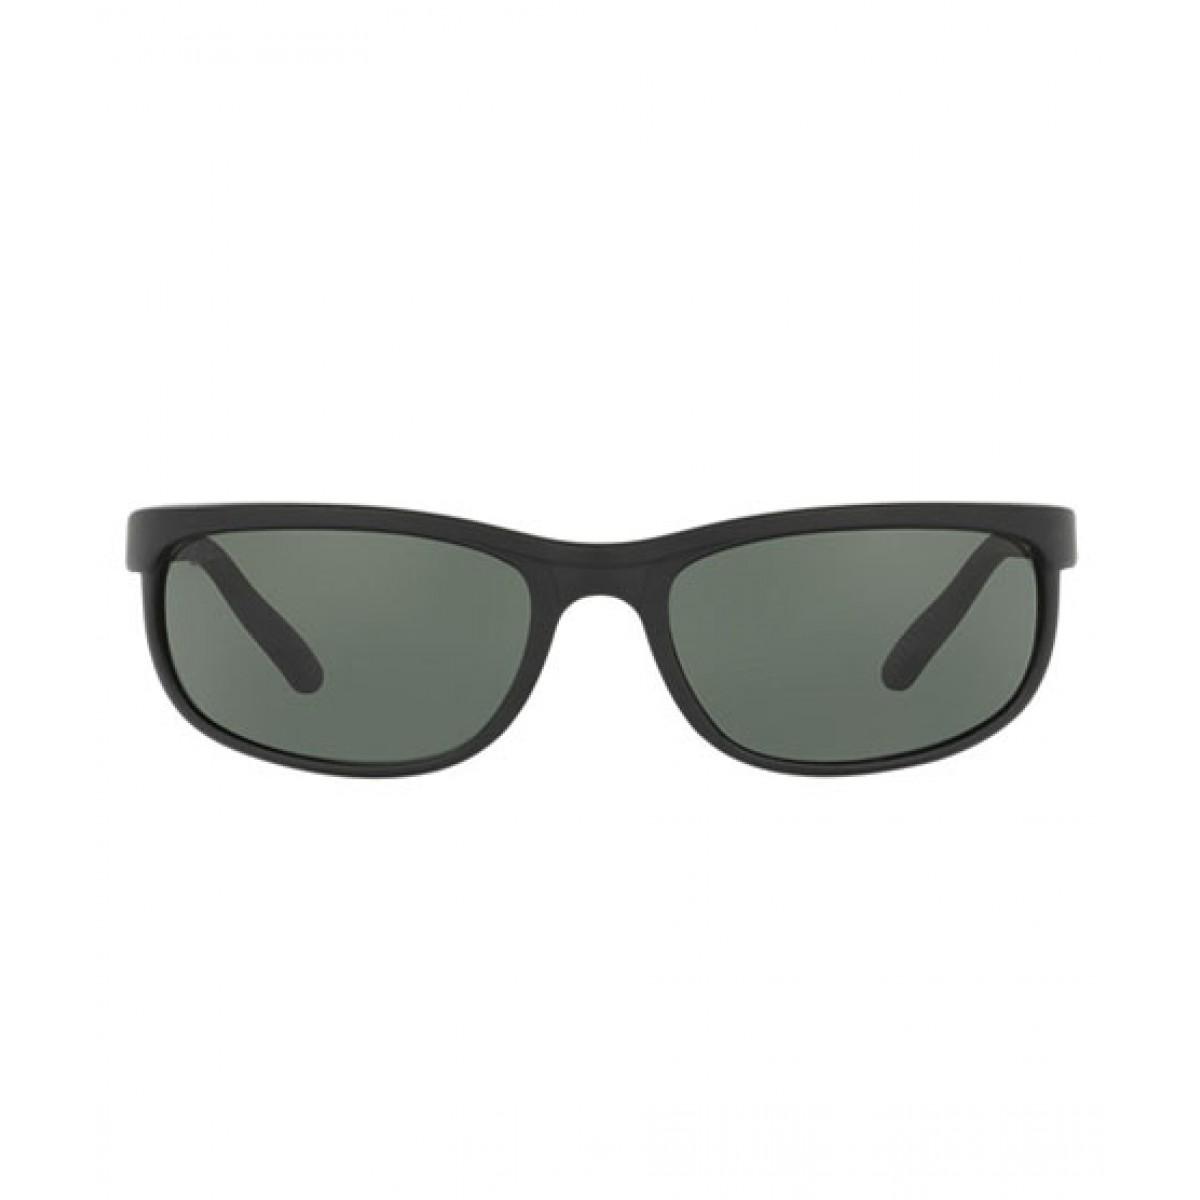 330ec176c0 RayBan Non-Polarized Sunglasses Price in Pakistan   Buy Predator 2 Non-Polarized  Sunglasses RB2027   iShopping.pk